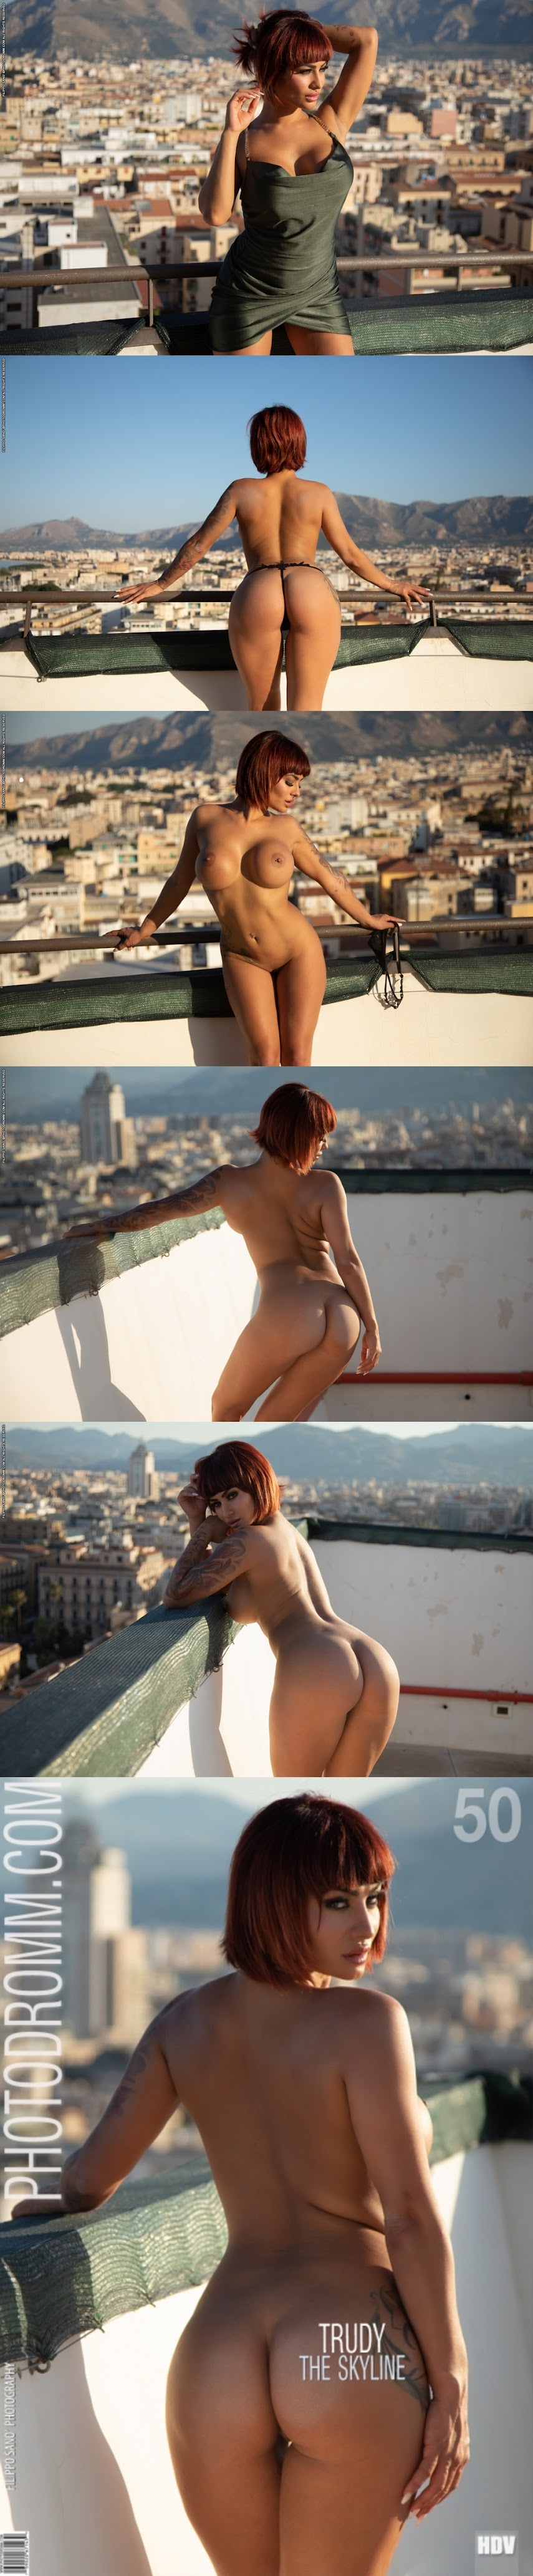 [PhotoDromm] Trudy - The Skyline